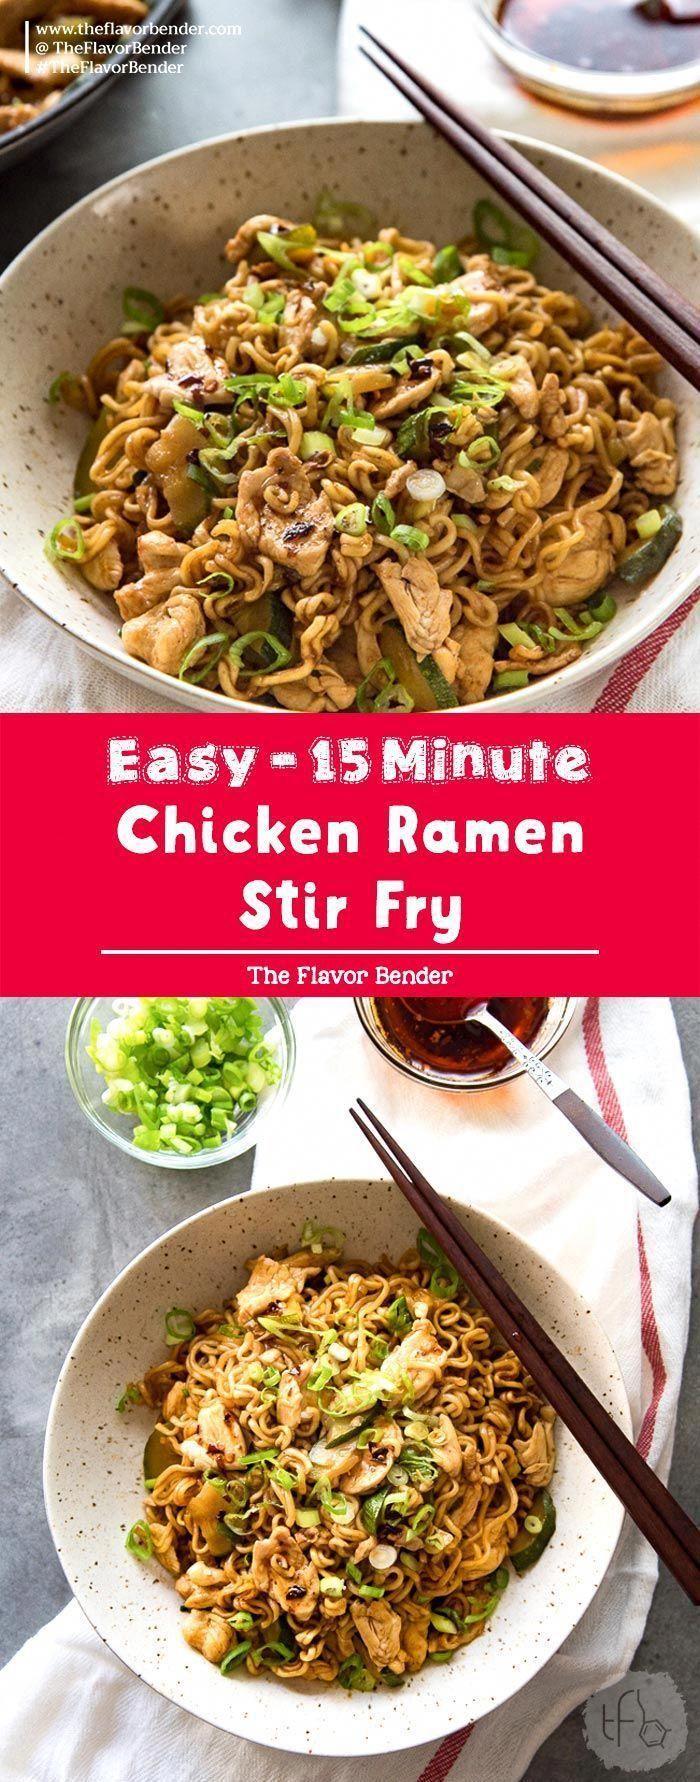 15 minute chicken ramen stir fry  a delicious way to